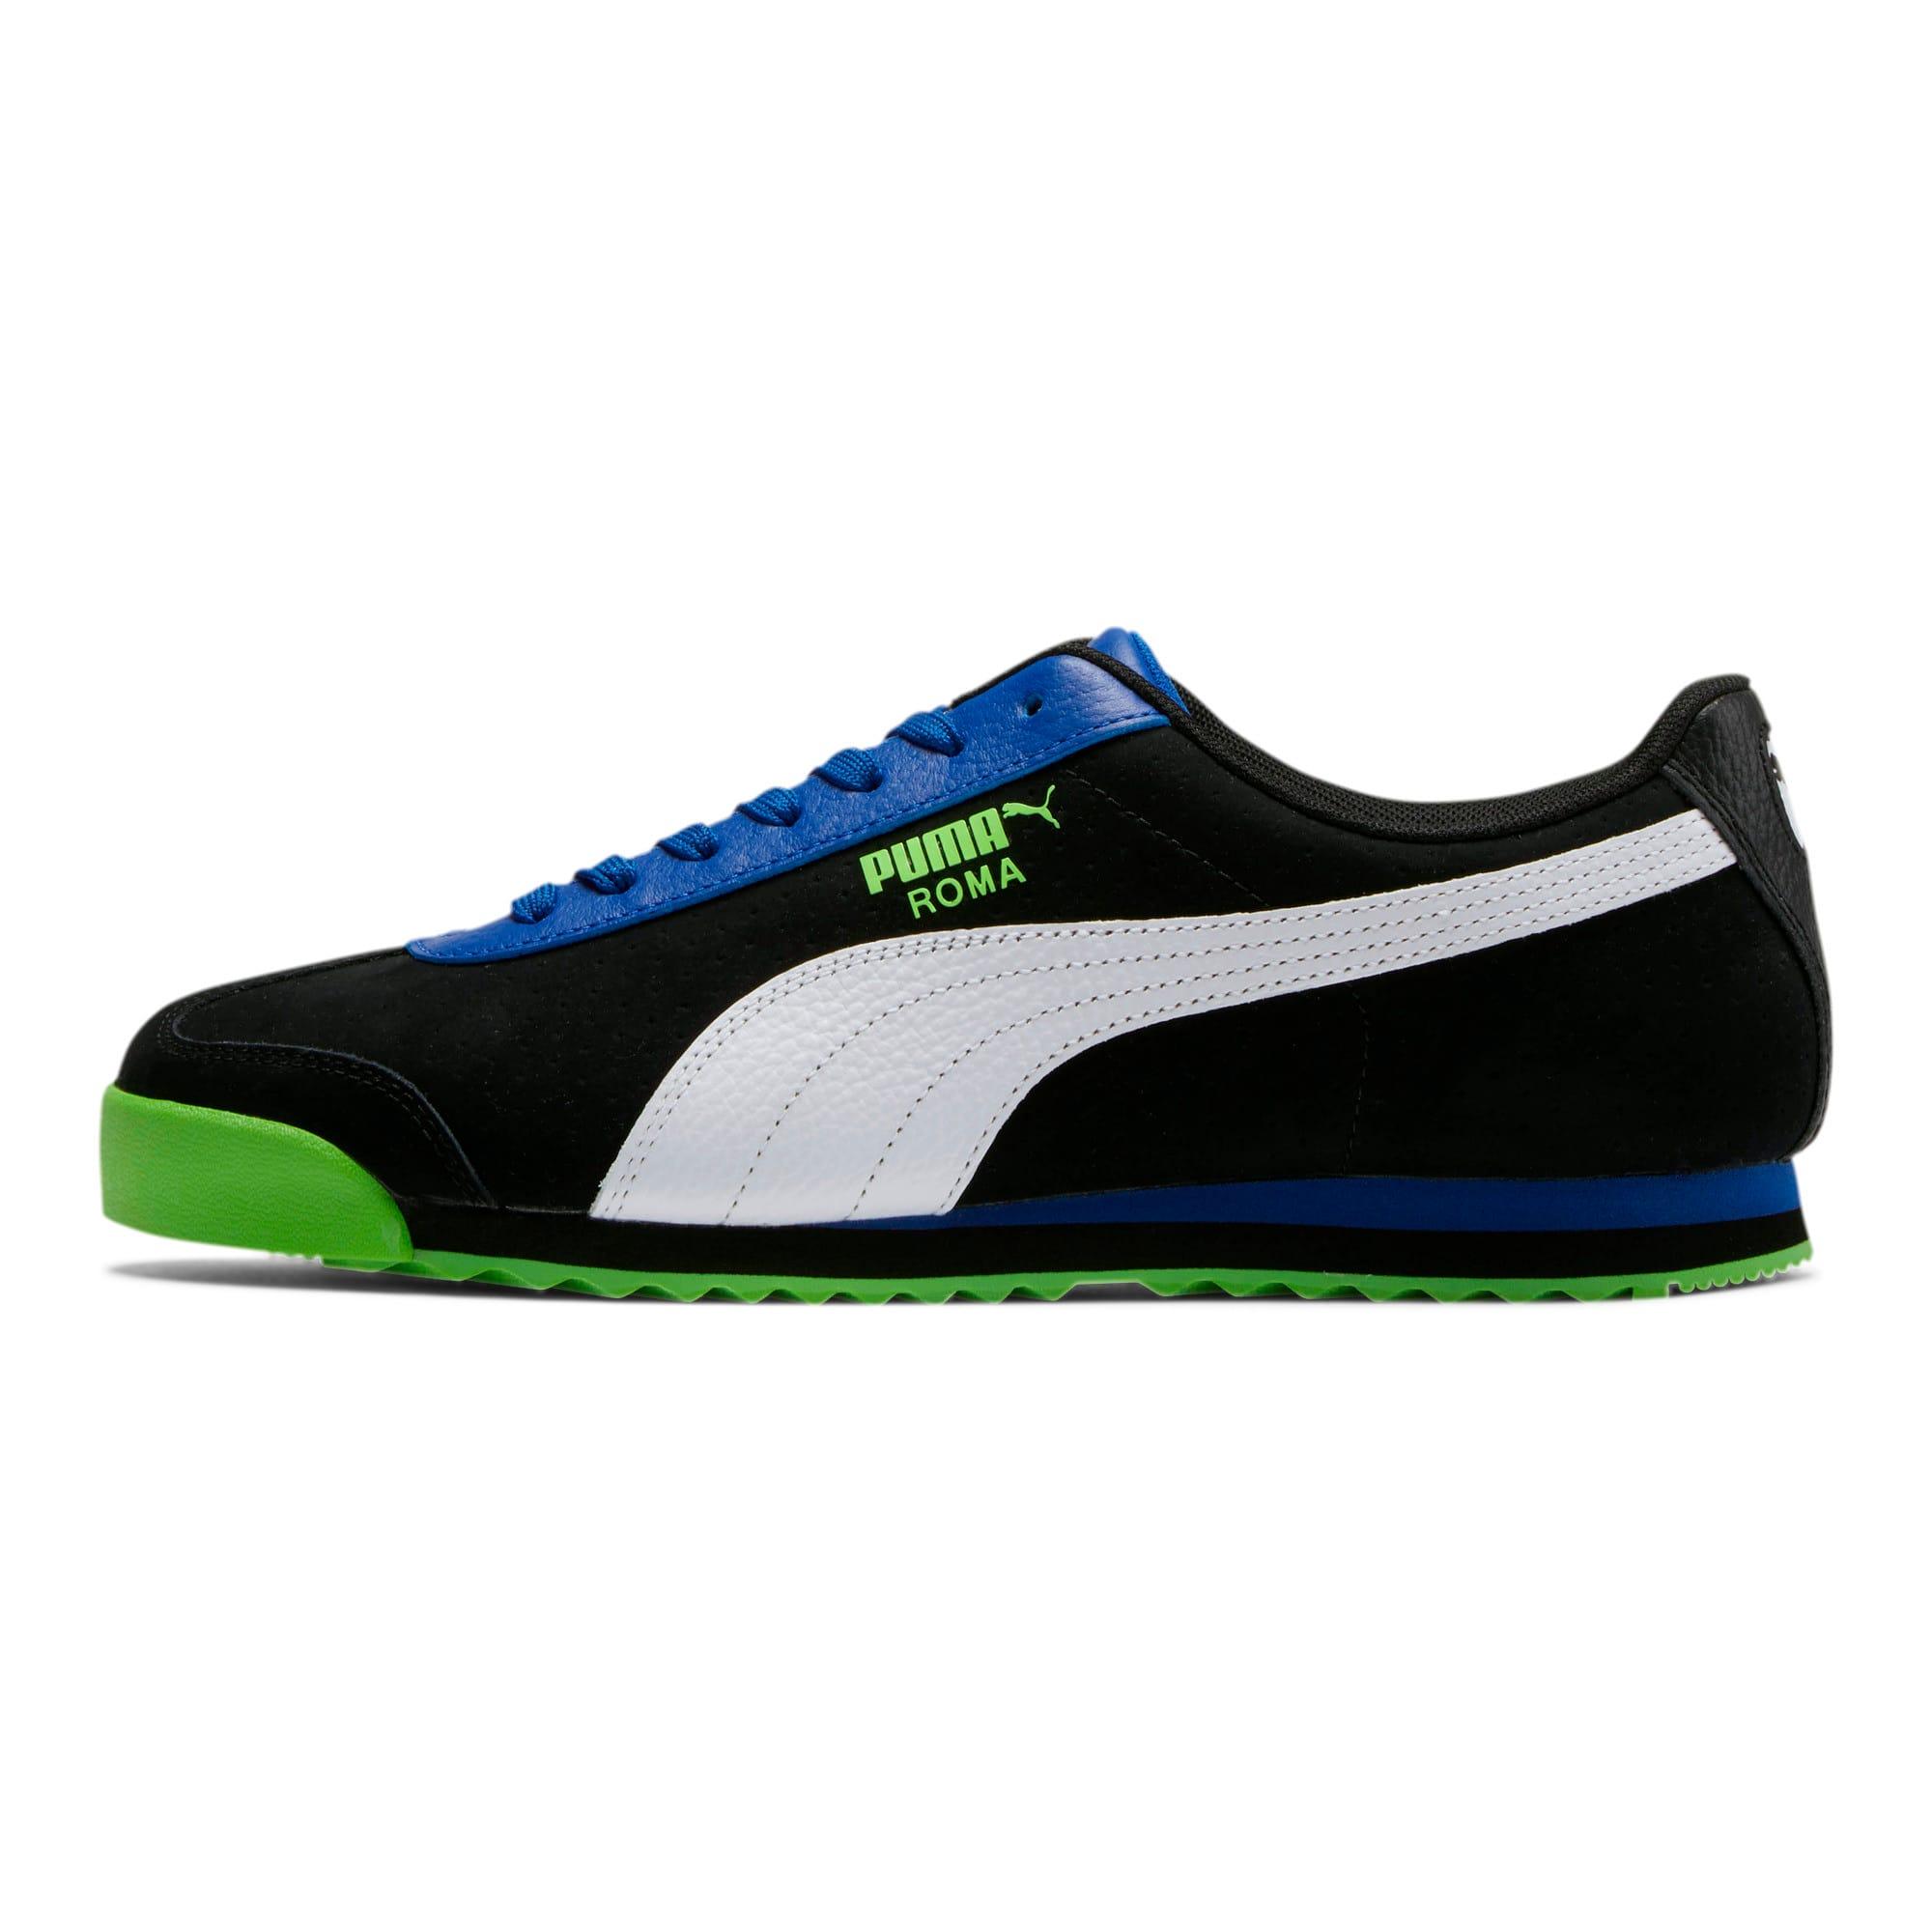 Thumbnail 1 of Roma XTG Perf Men's Sneakers, Puma Black-Surf The Web, medium